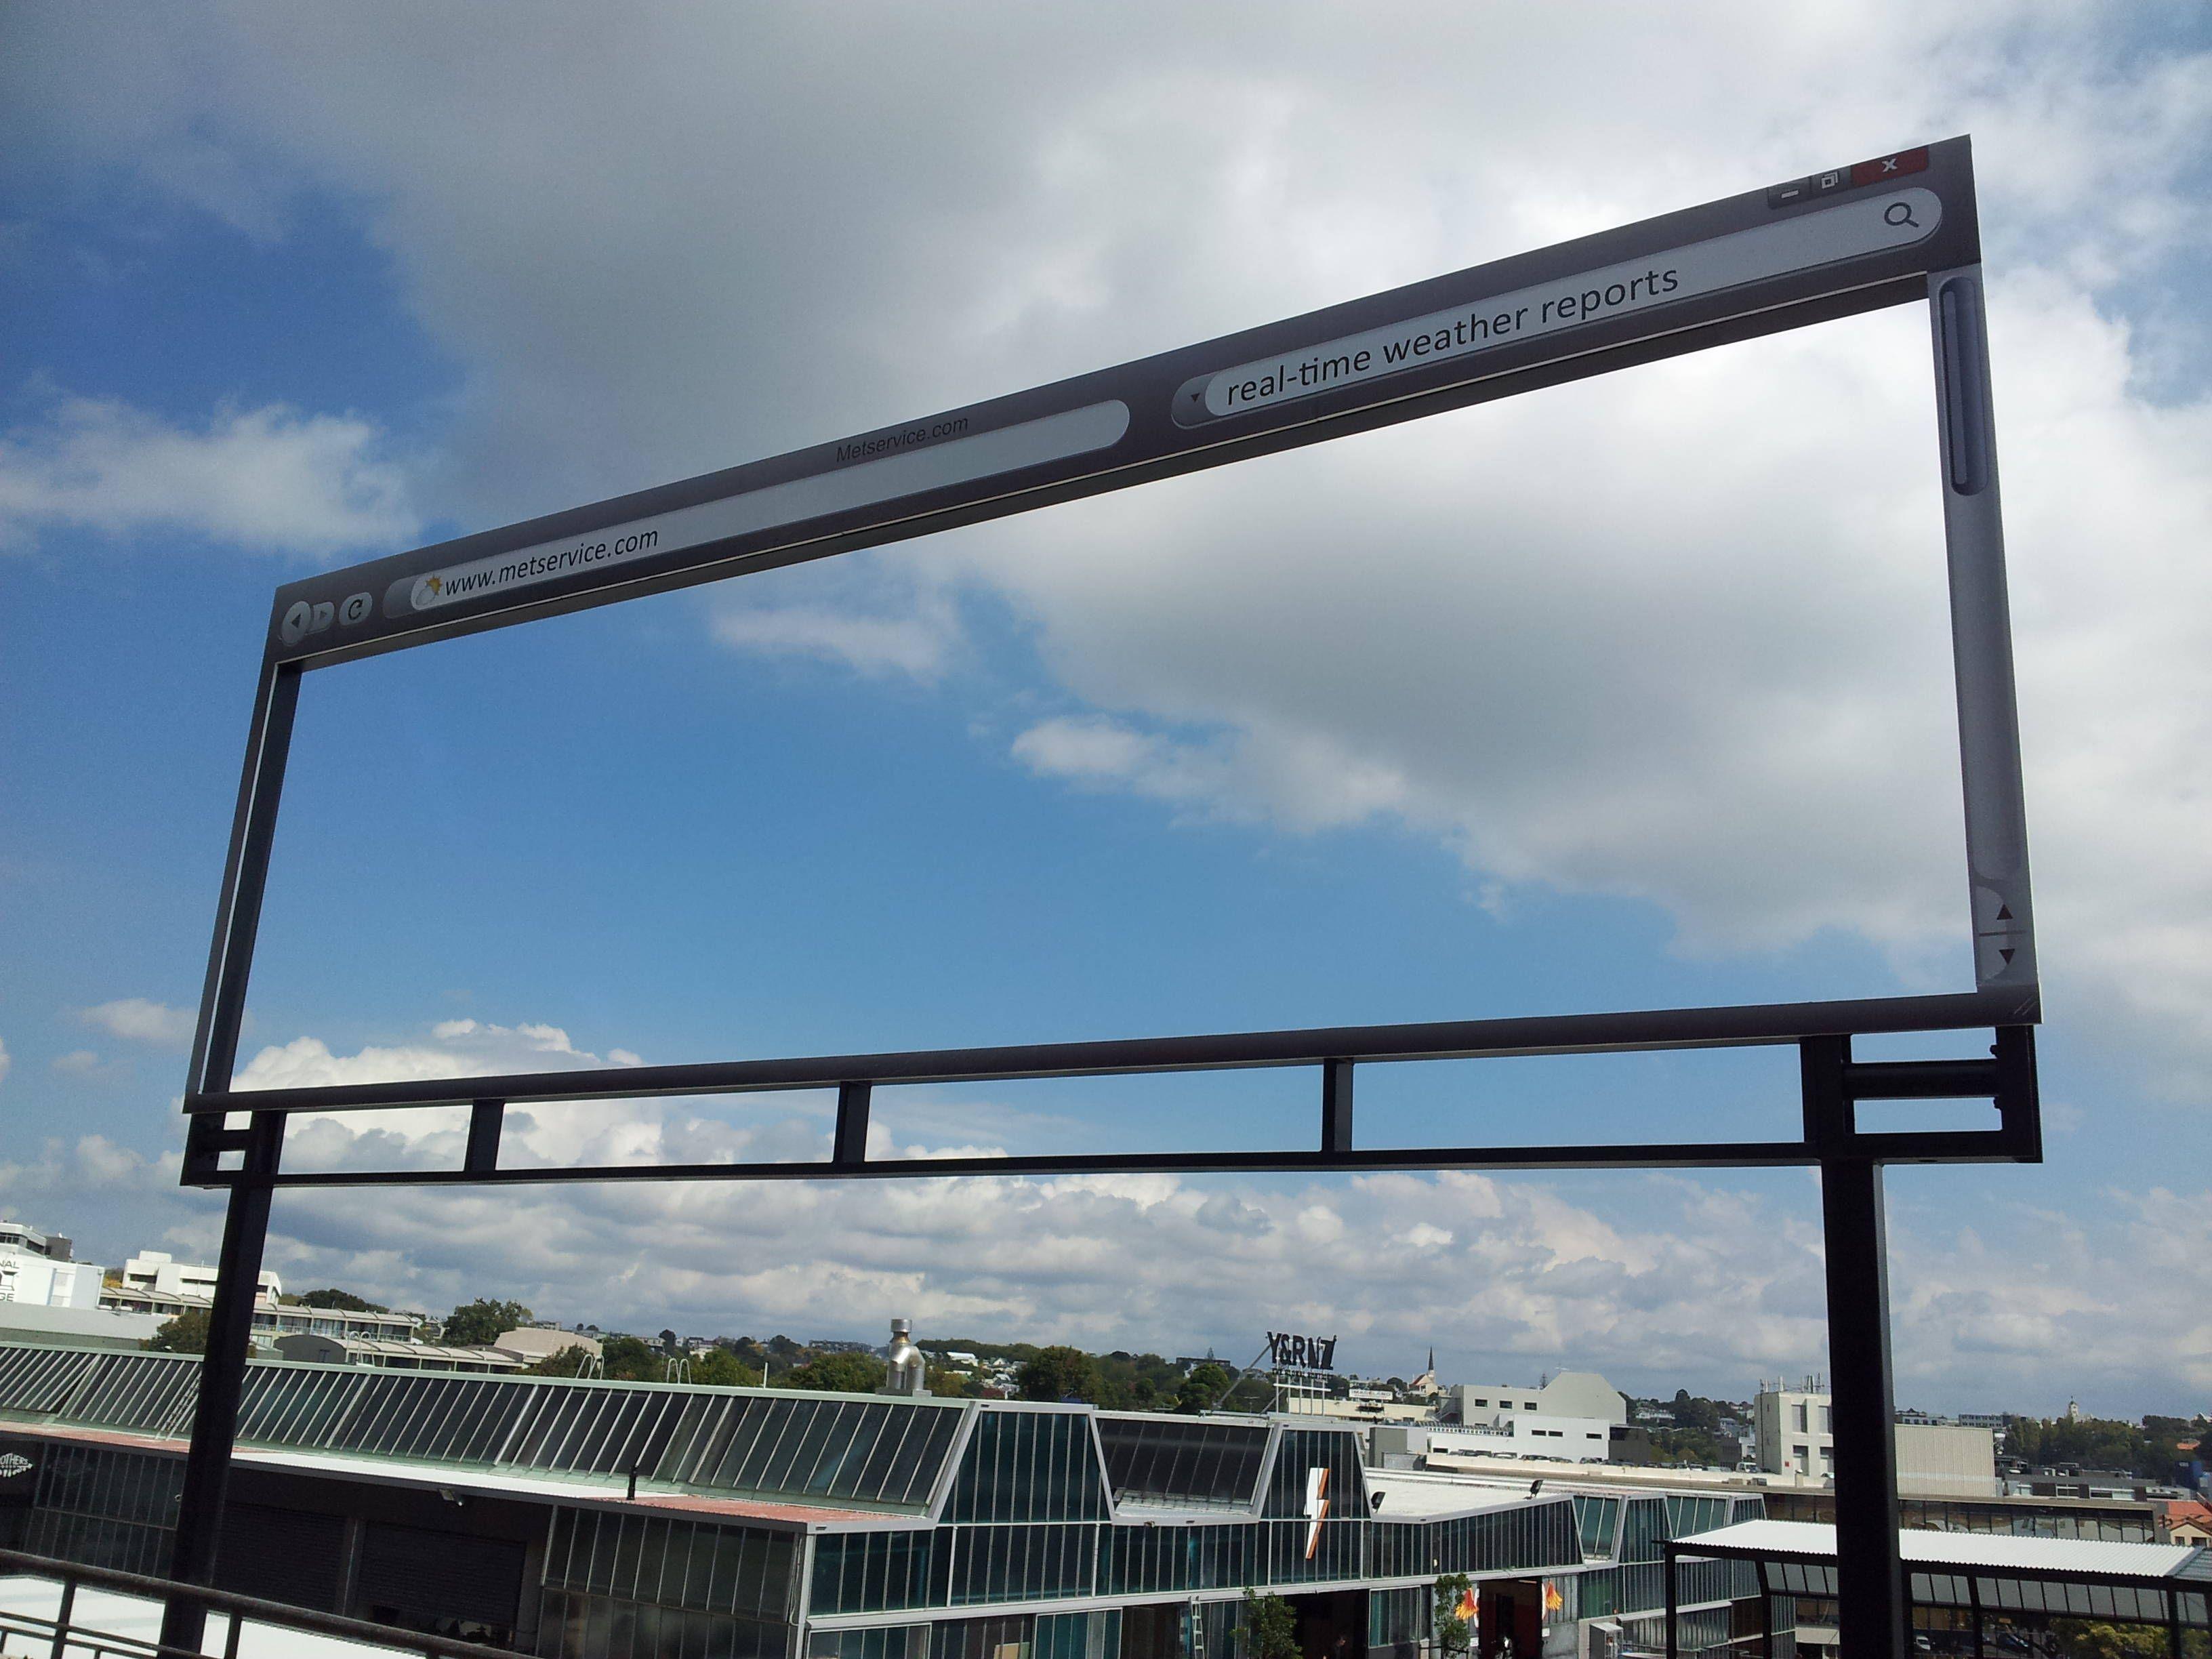 dans-ta-pub-billboard-panneau-affichage-creatif-creative-compilation-12